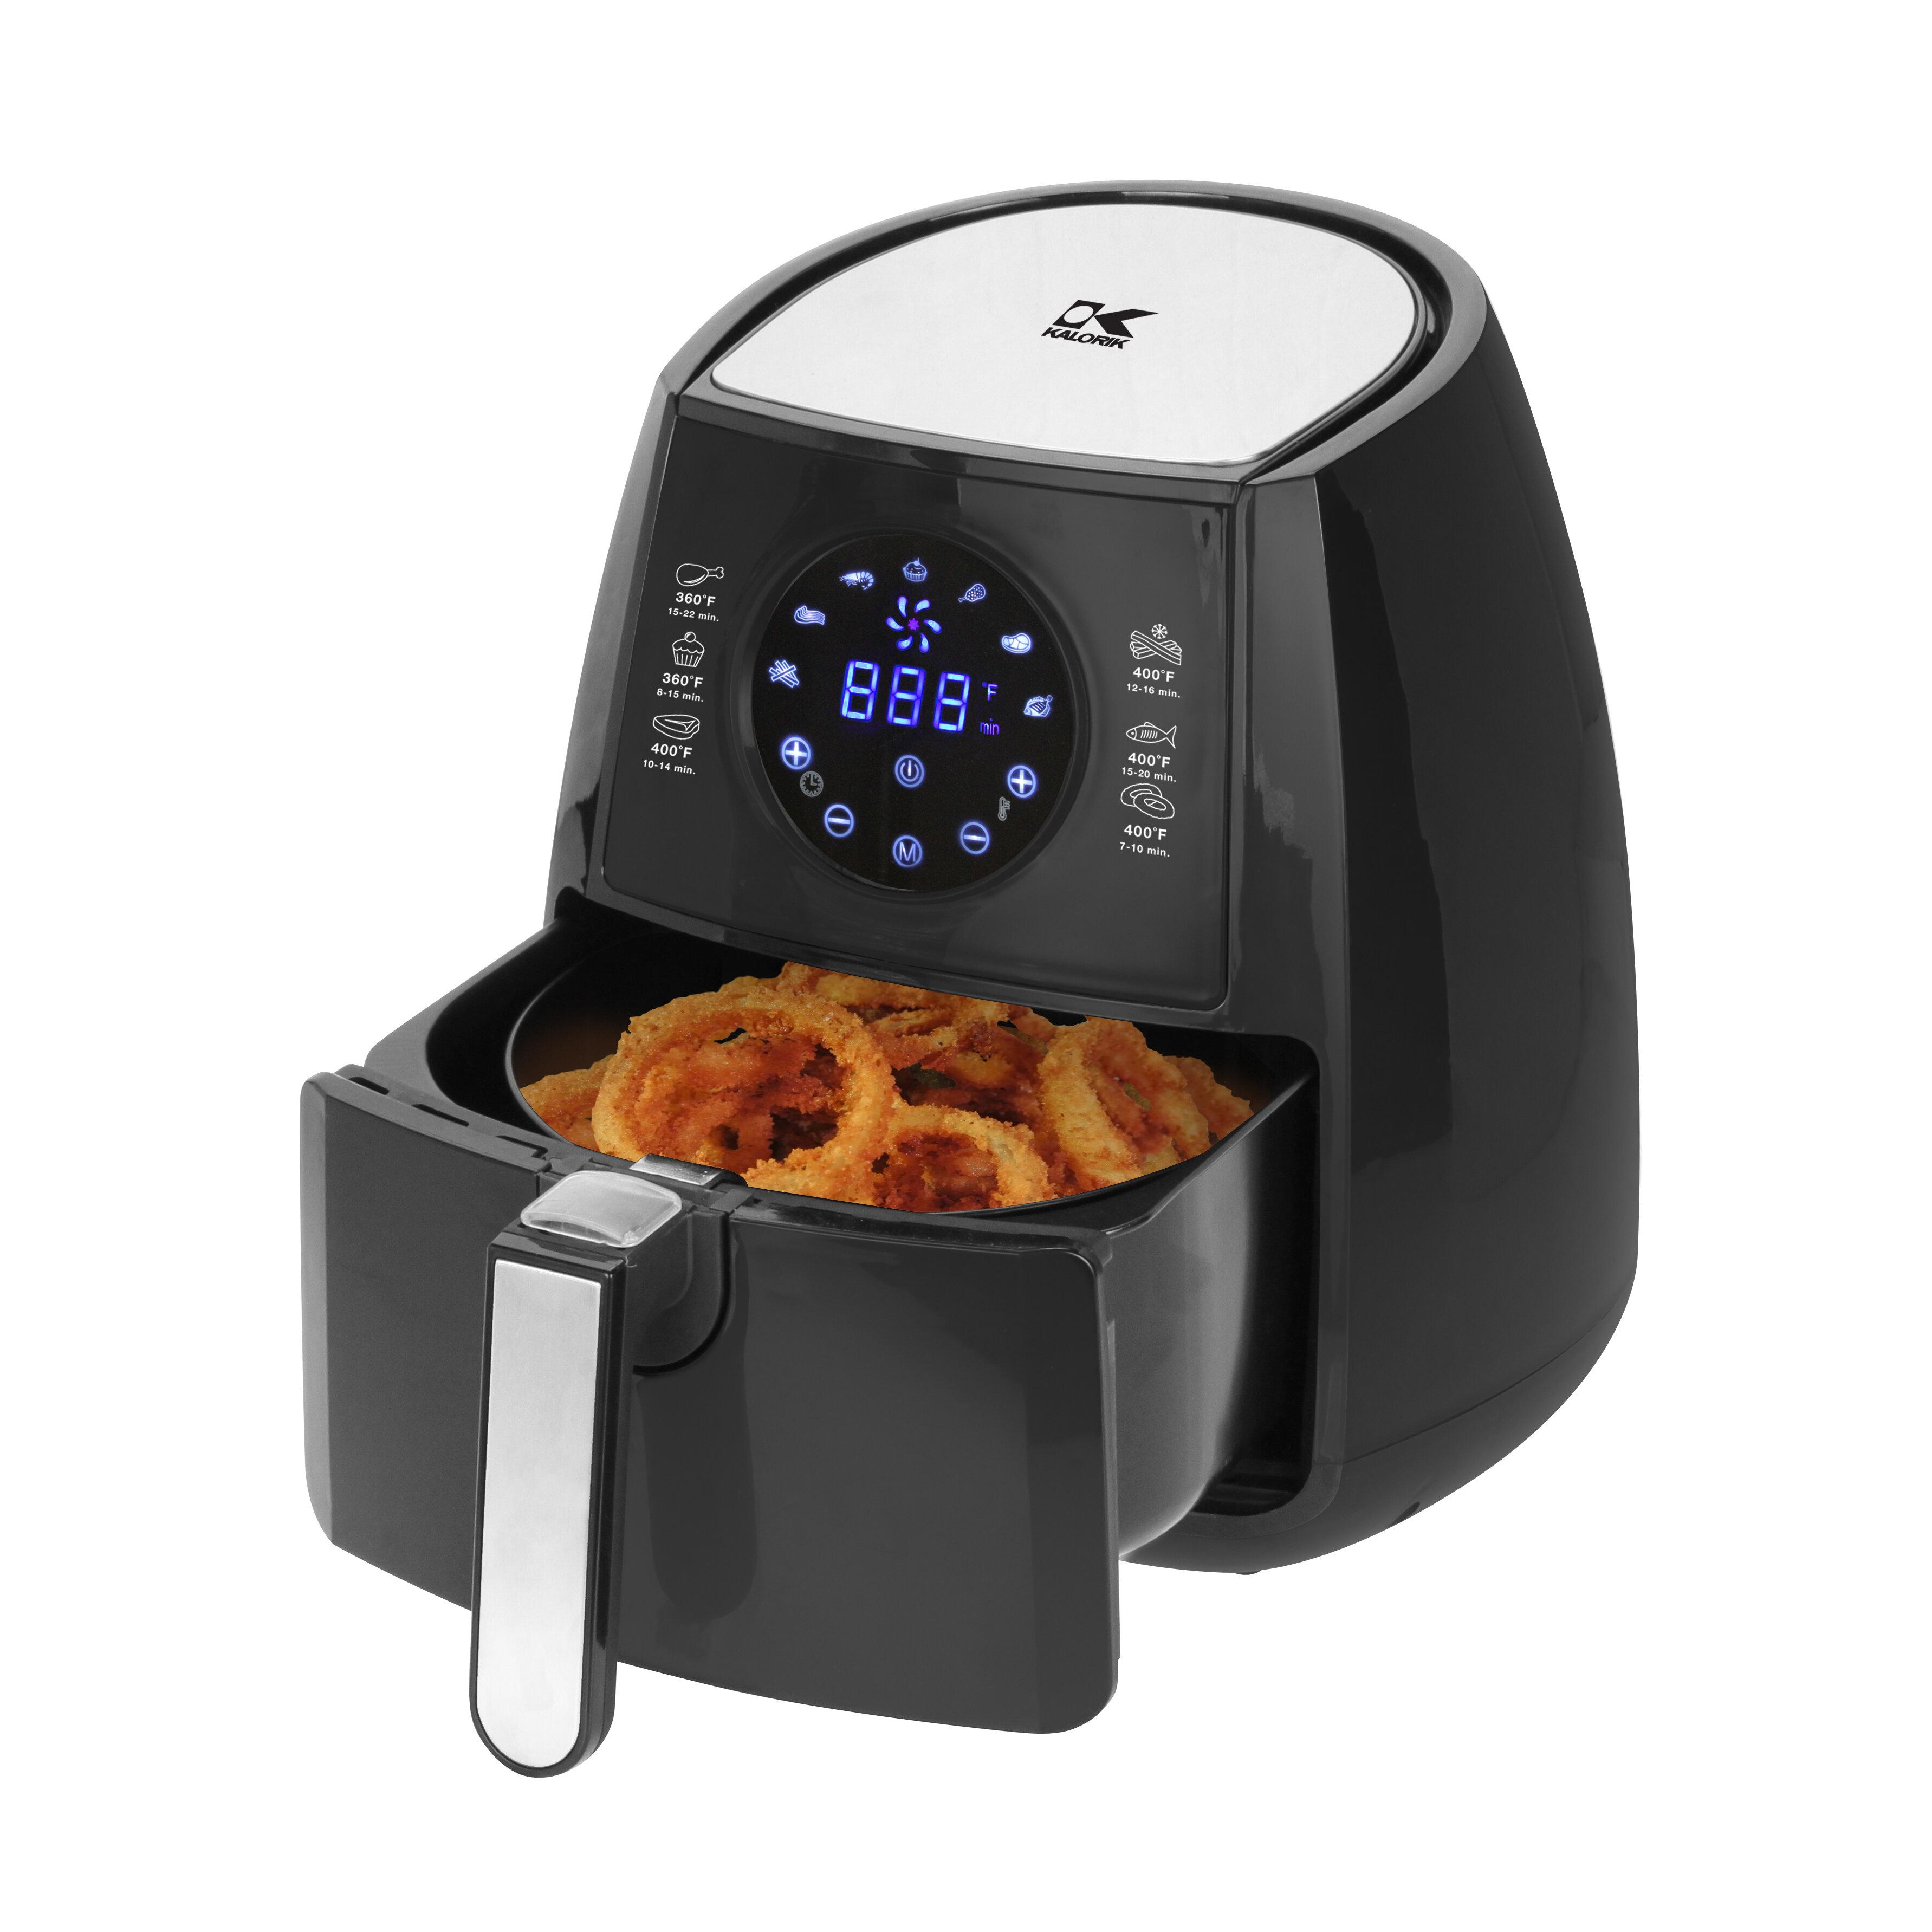 Kalorik 2 Liter Digital Air Fryer with Pie Pan & Reviews | Wayfair